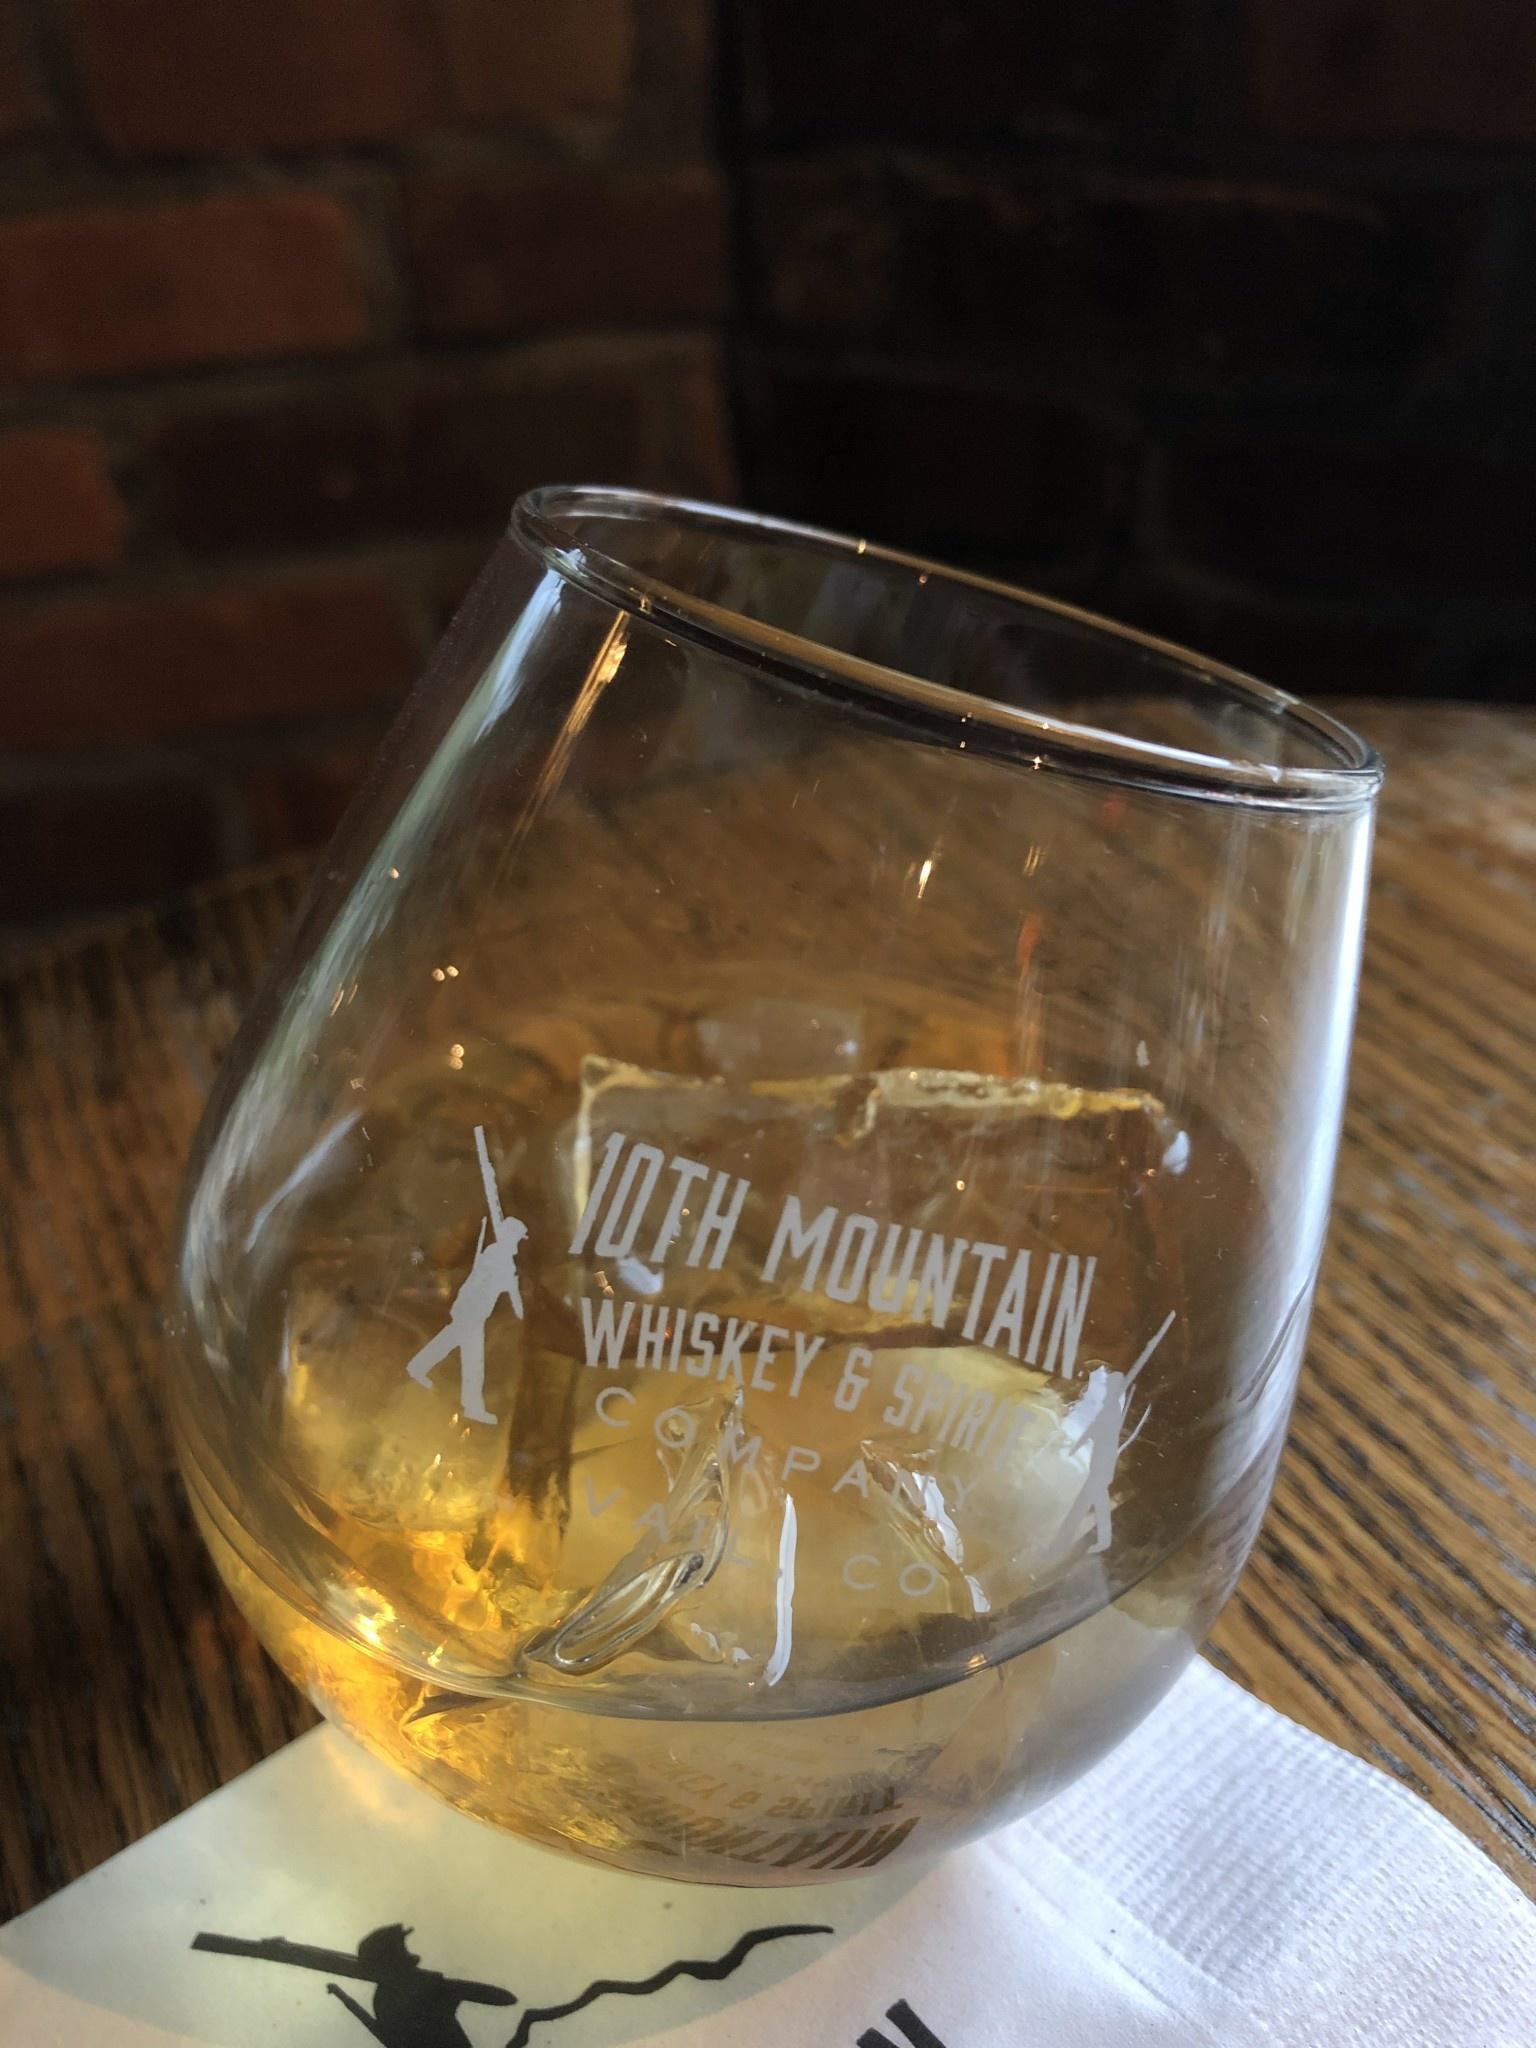 10th Mountain Whiskey & Spirit Co. Rocker Glass